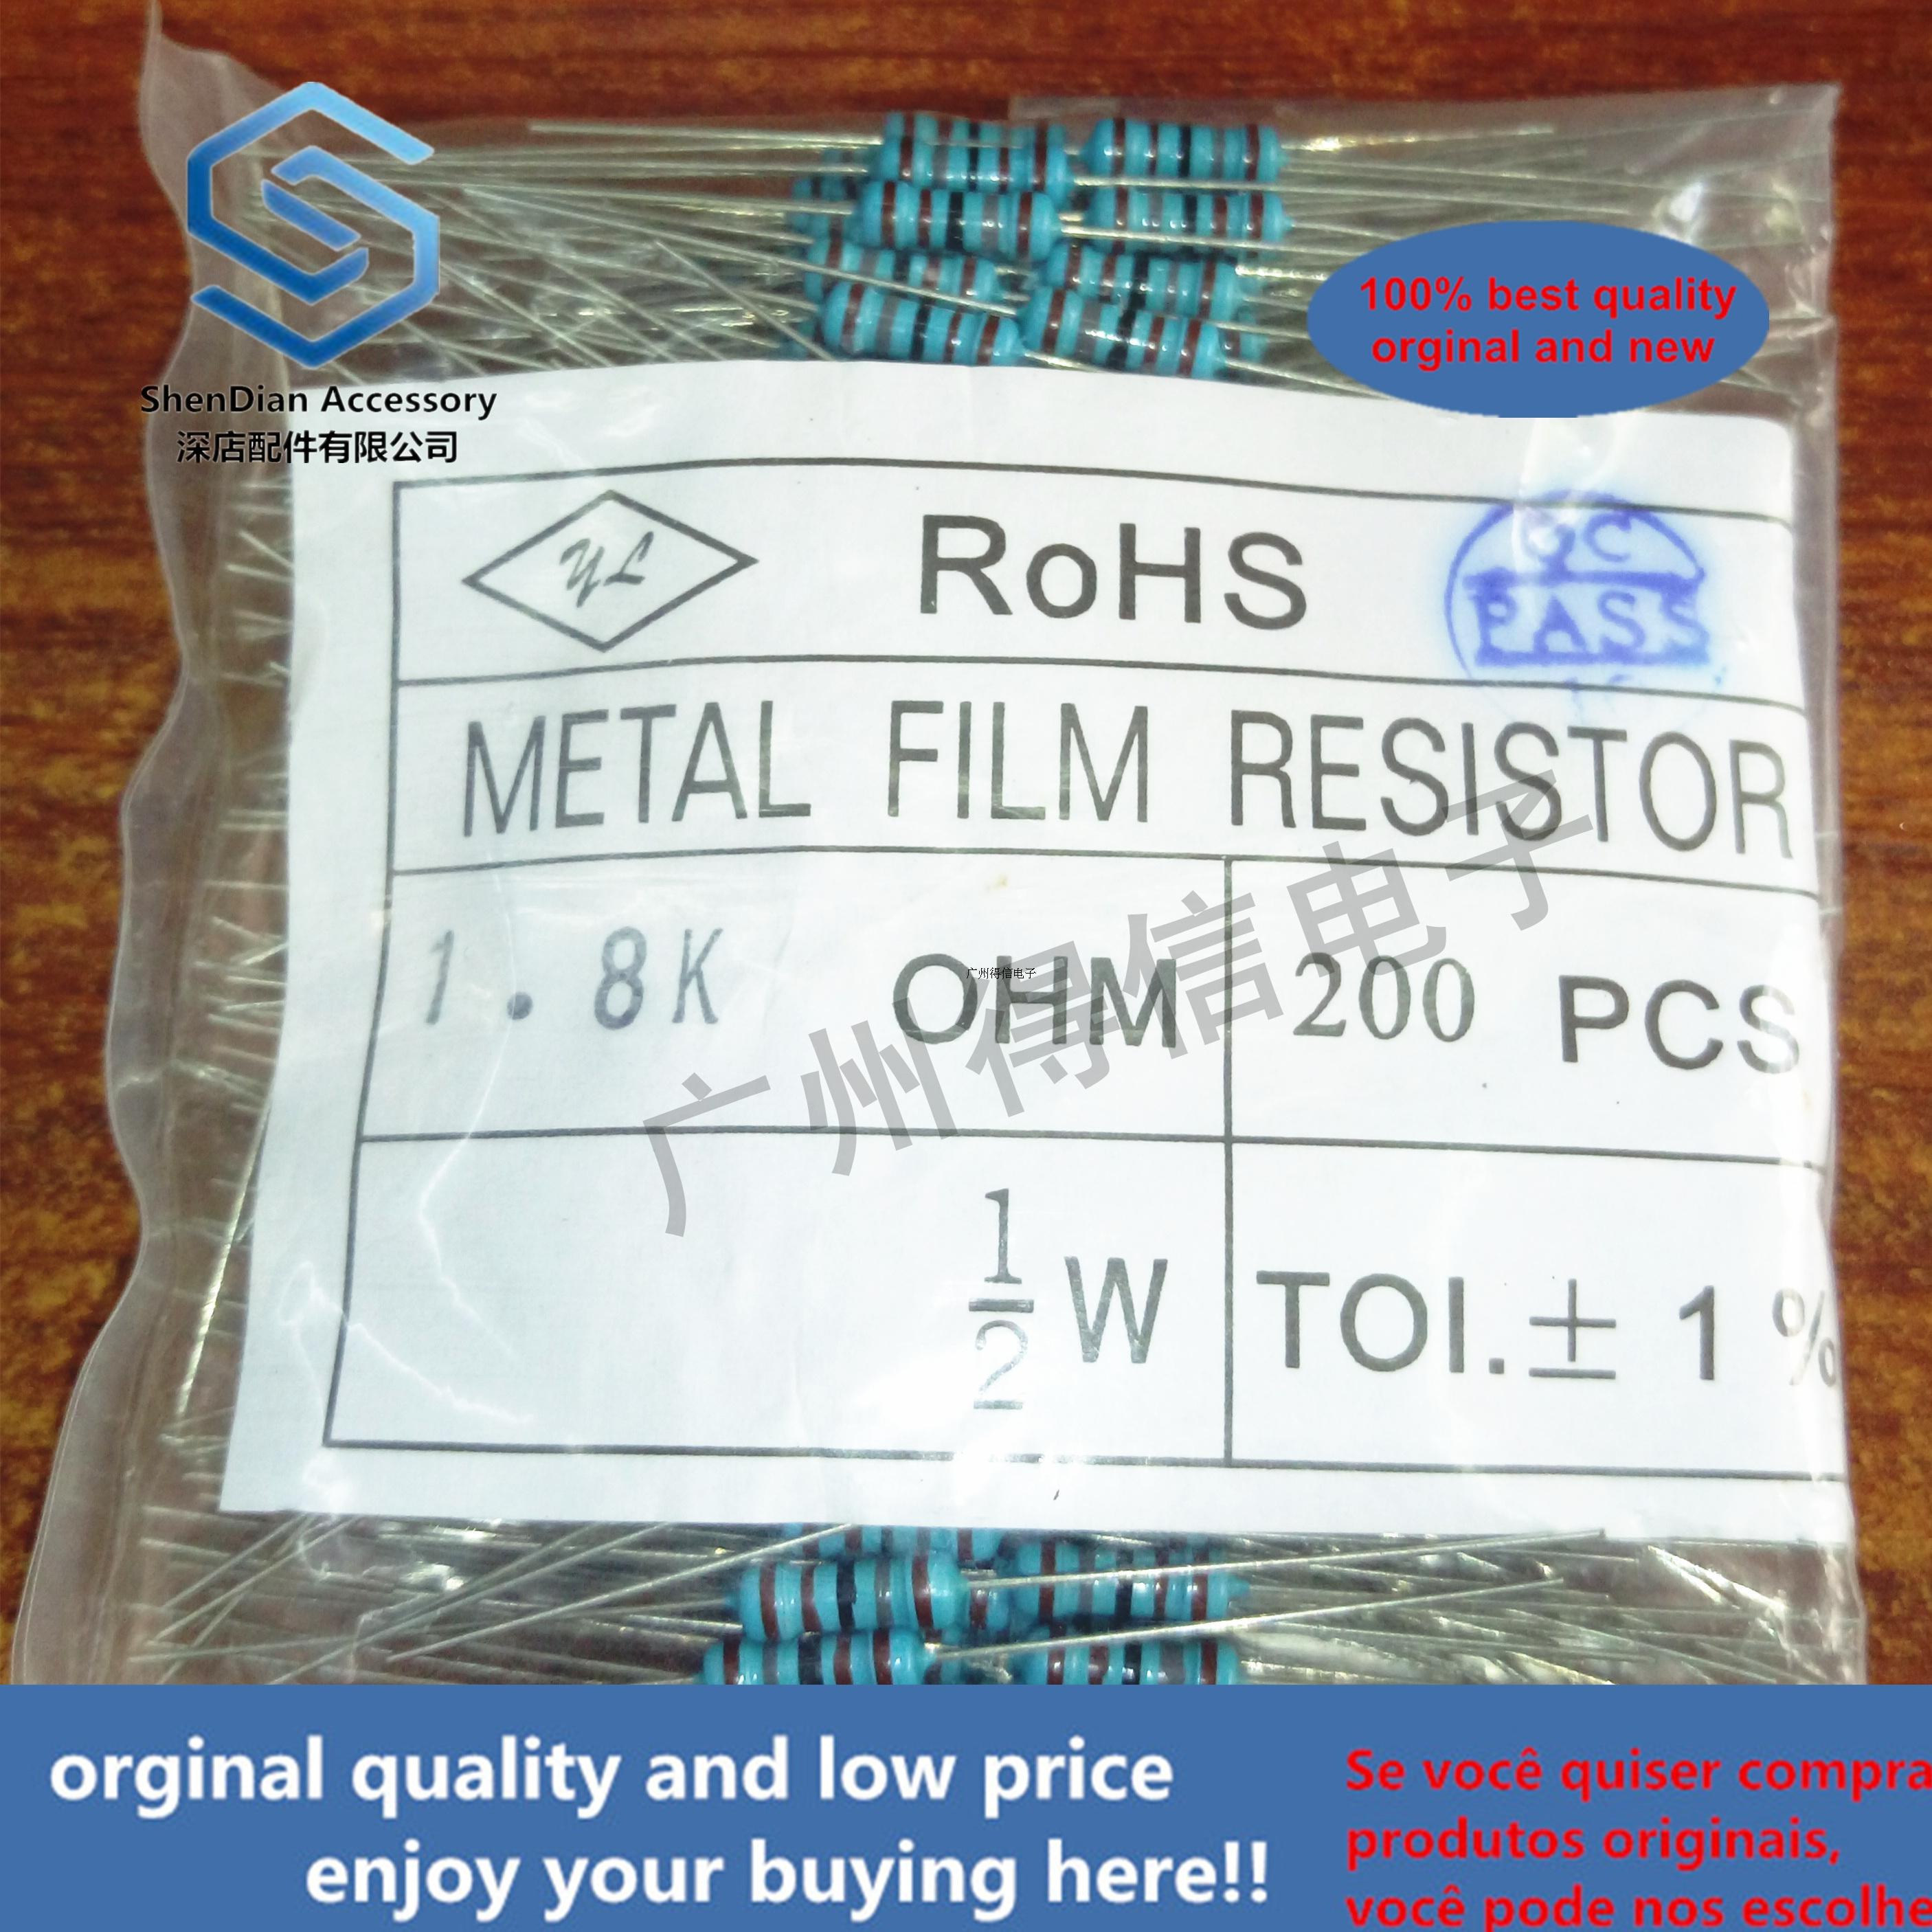 200pcs 1 / 2W 120K 1% Brand New Metal Film Iron Feet Resistor Bag 200 Pcs